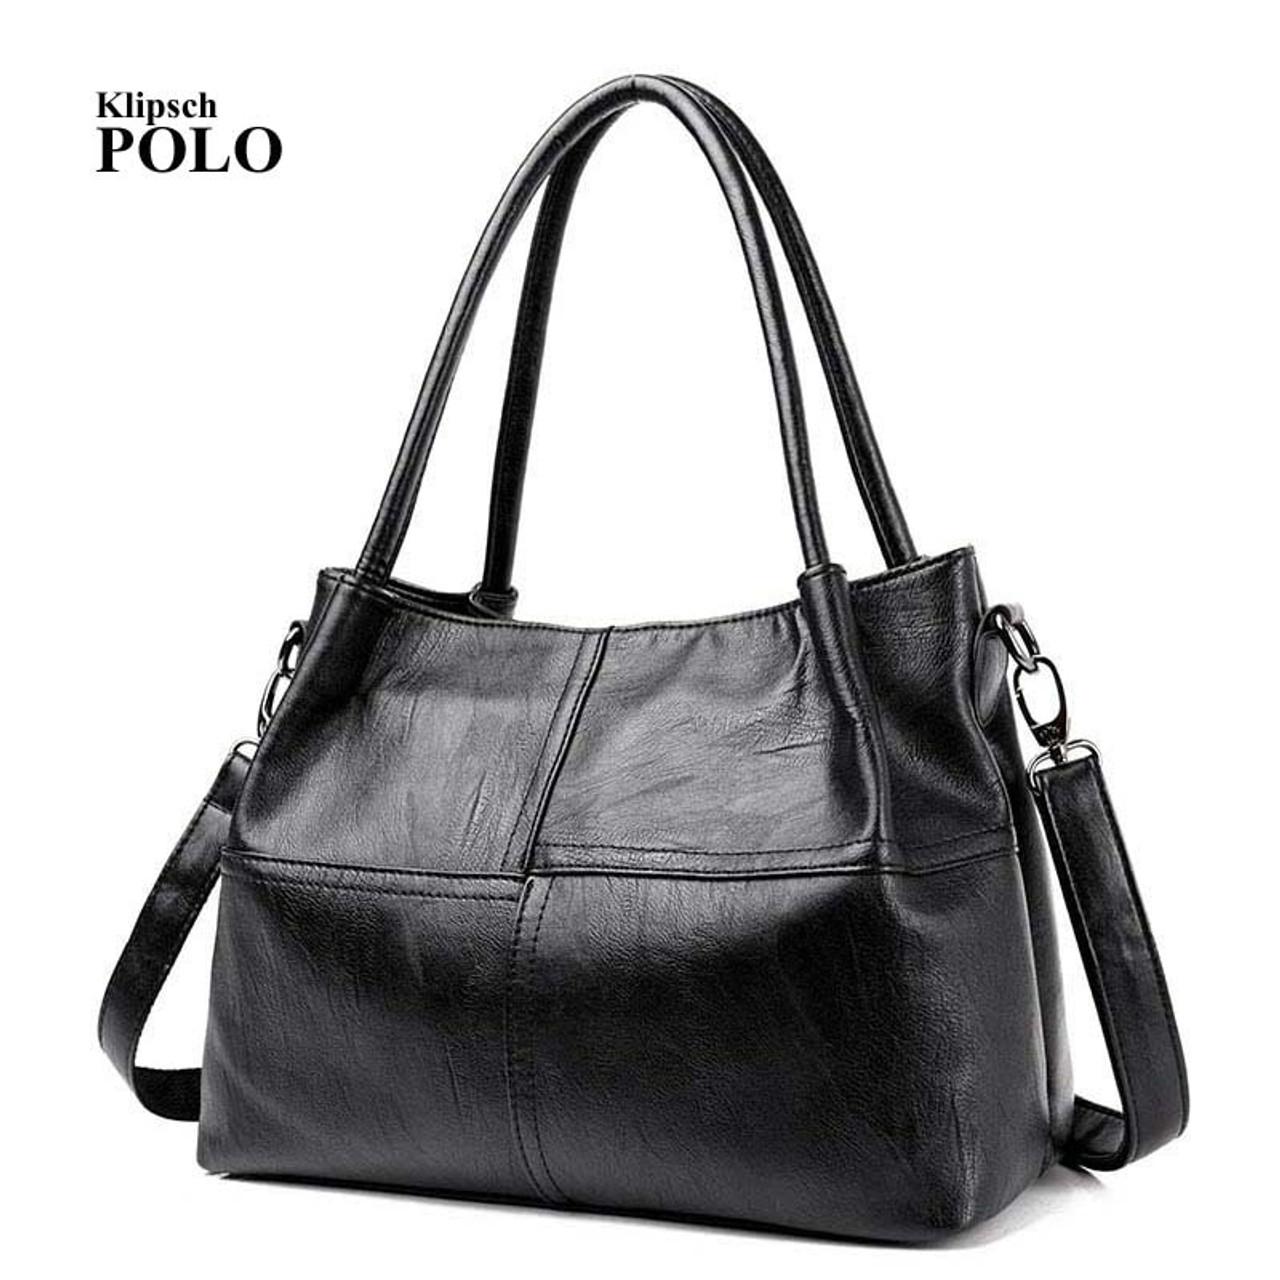 a29cf9d7c351 Fashion Ladies Hand Bag Women s Genuine Leather Handbag Black Leather Tote  Bag Bolsas femininas Female Shoulder ...